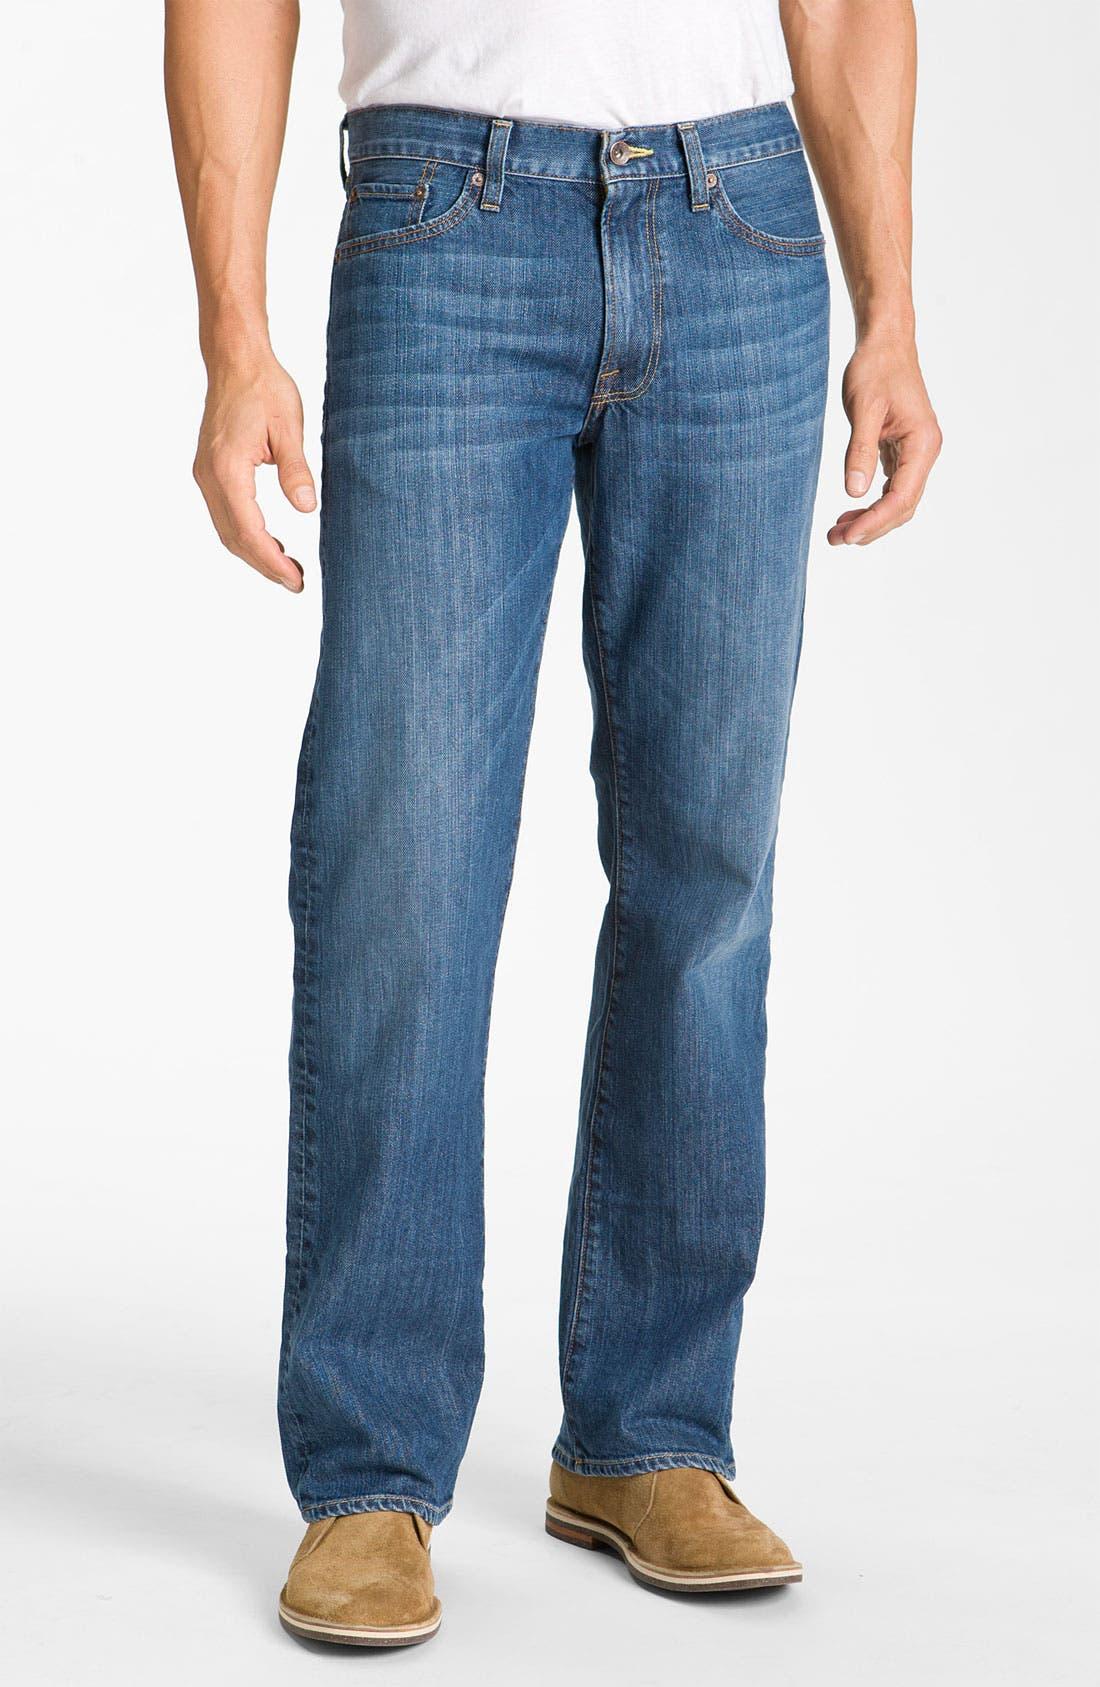 Alternate Image 1 Selected - Lucky Brand '361 Vintage' Straight Leg Jeans (Rinse)